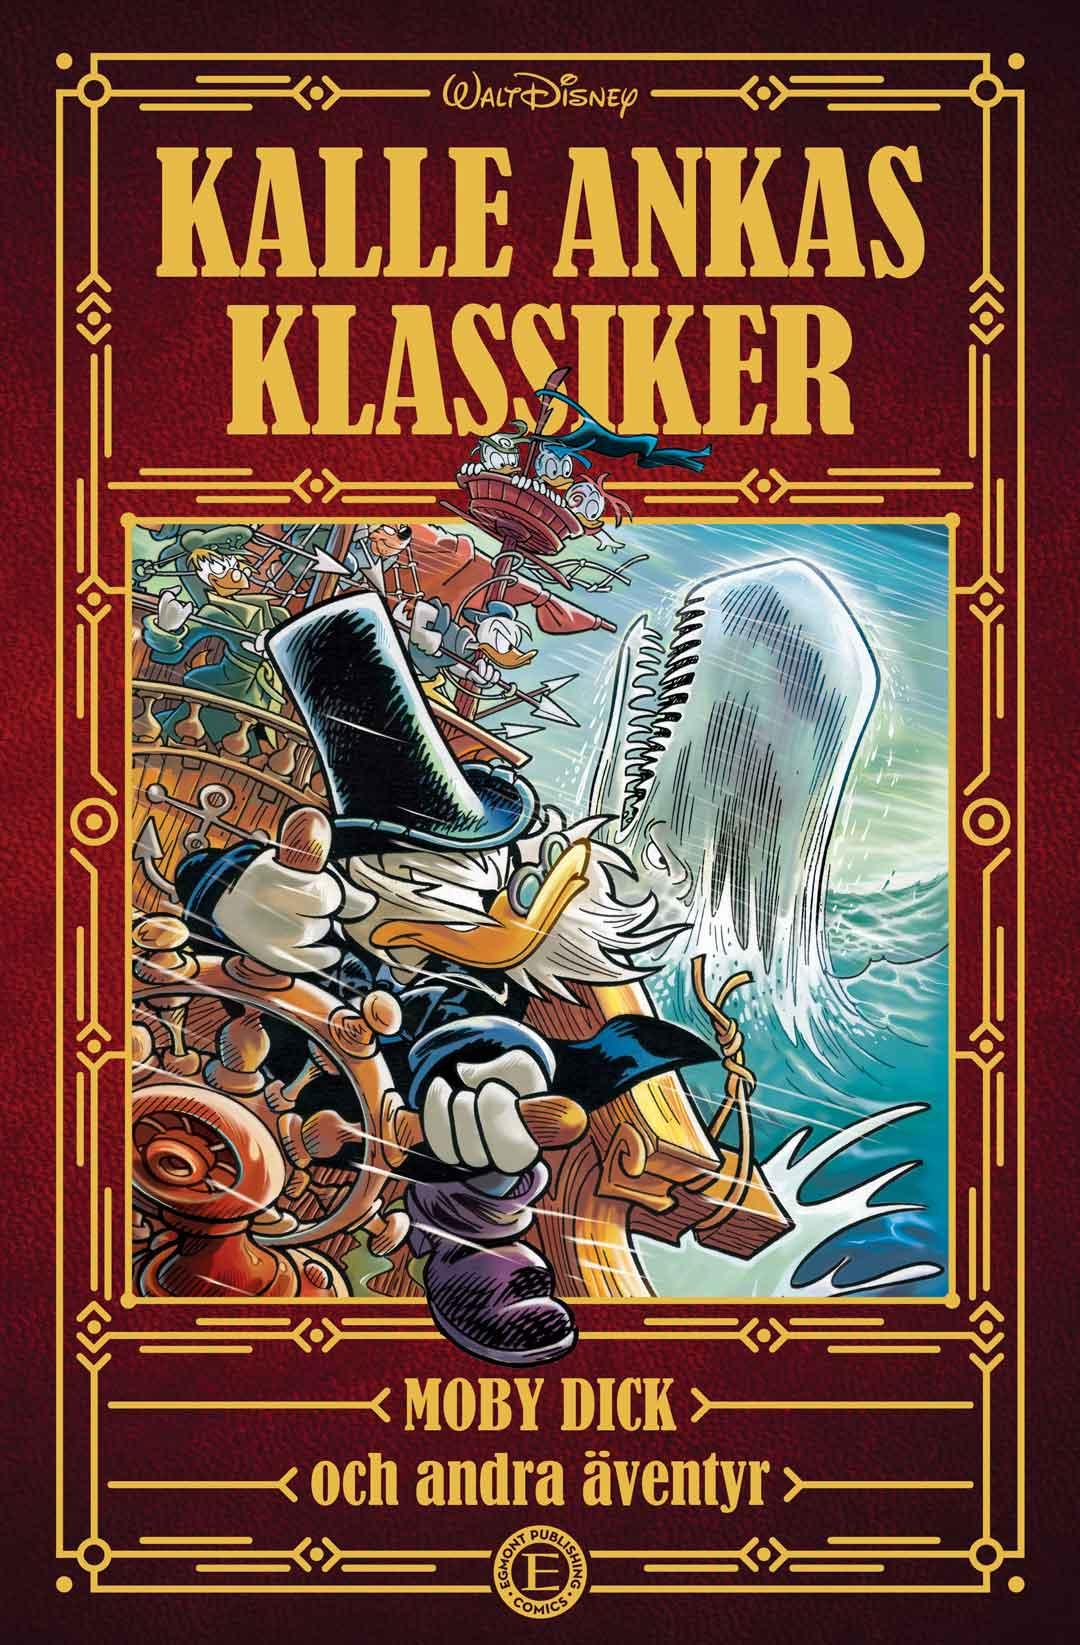 Kalle Ankas Klassiker 1: Moby Dick